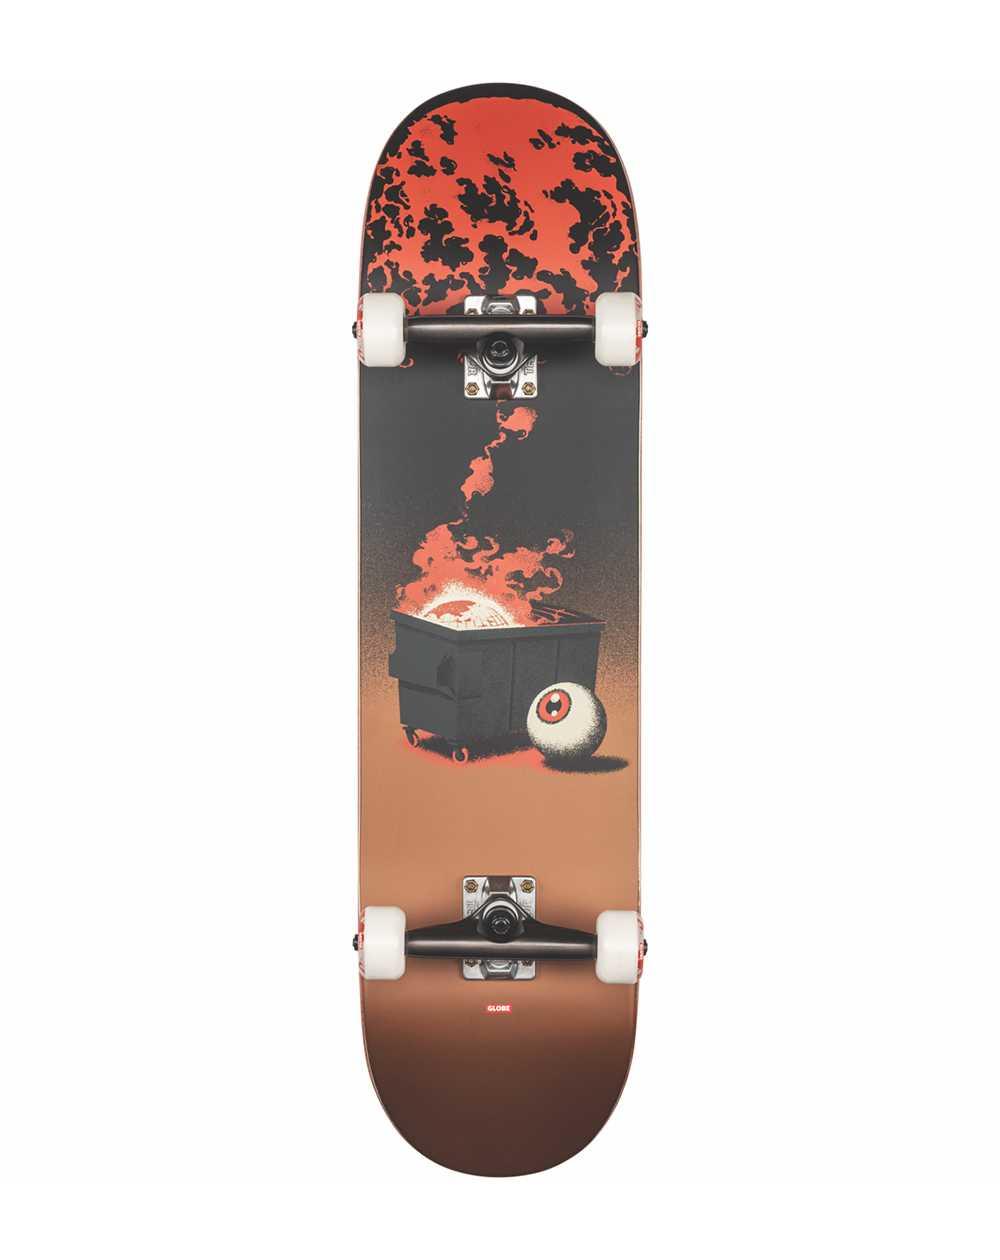 "Globe G2 On the Brink 8.25"" Complete Skateboard Dumpster Fire"